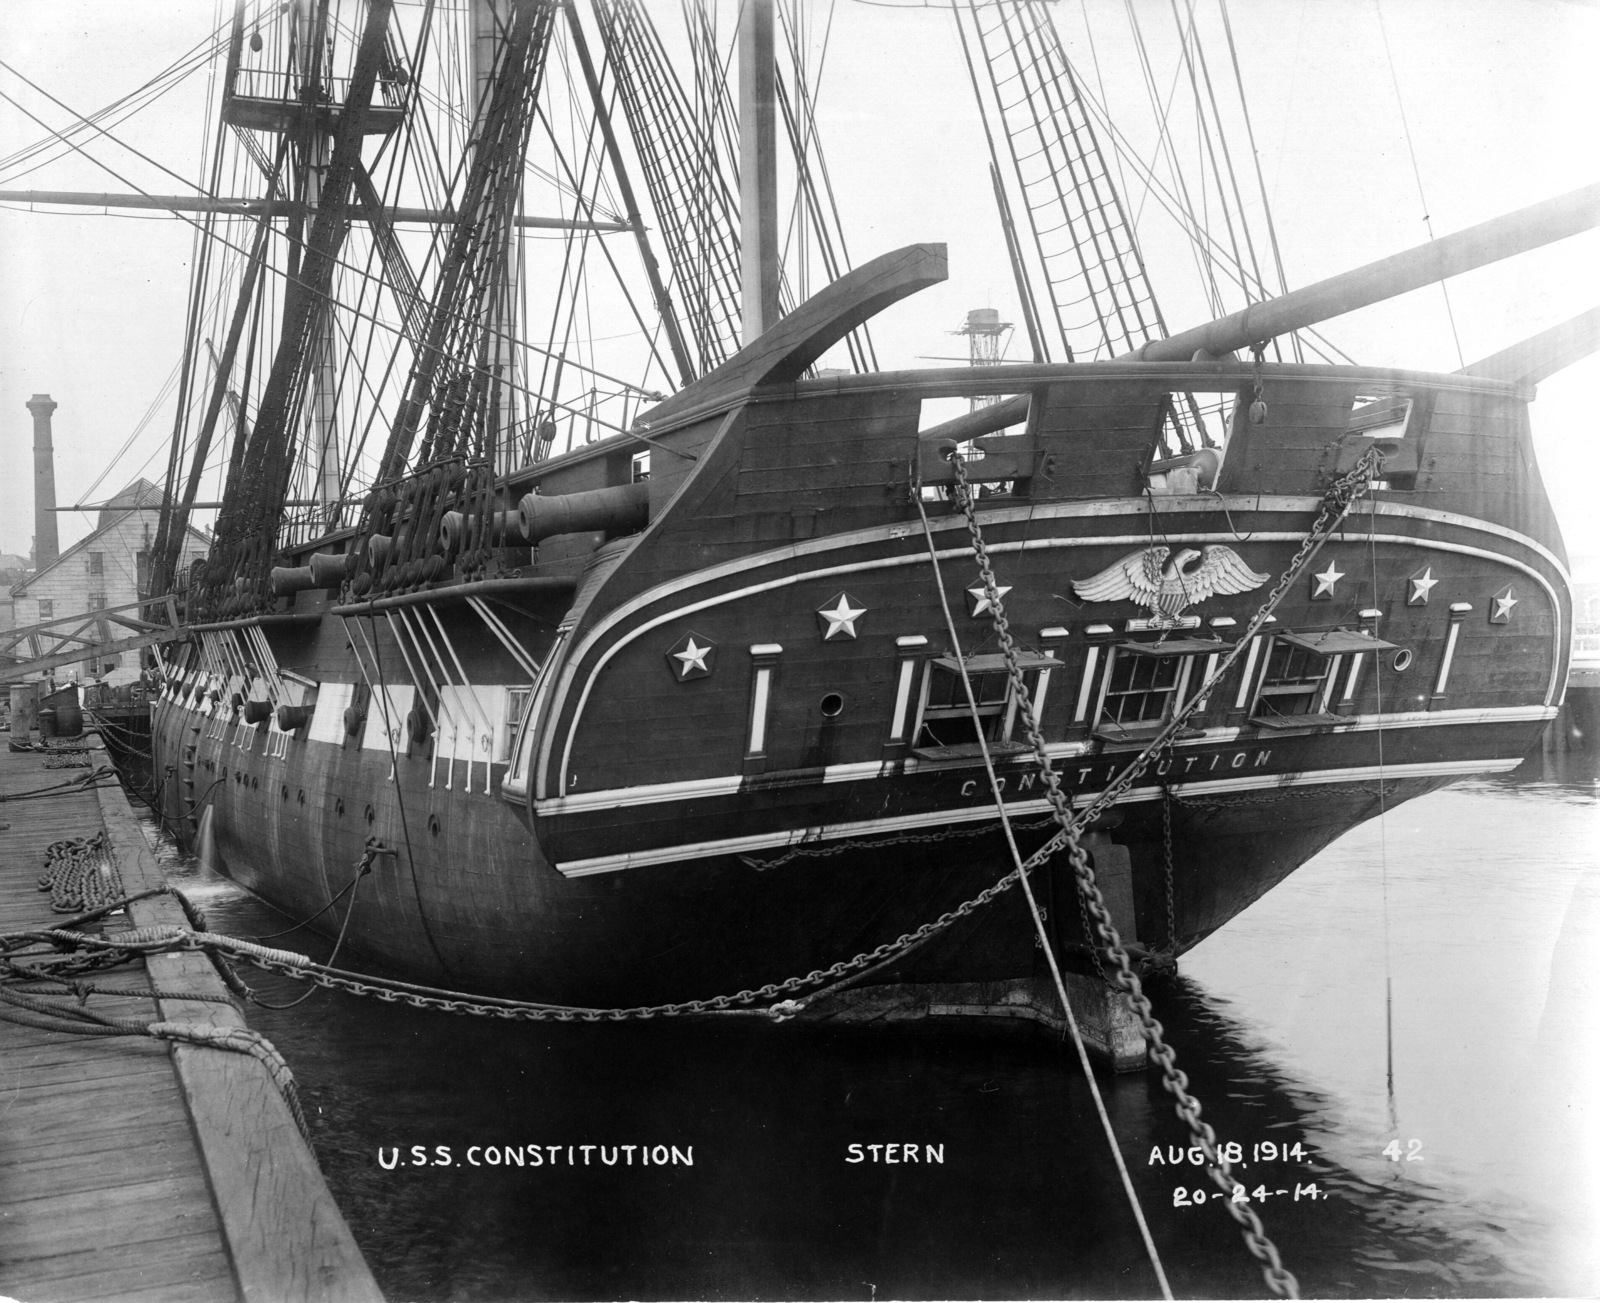 USS Constitution Stern